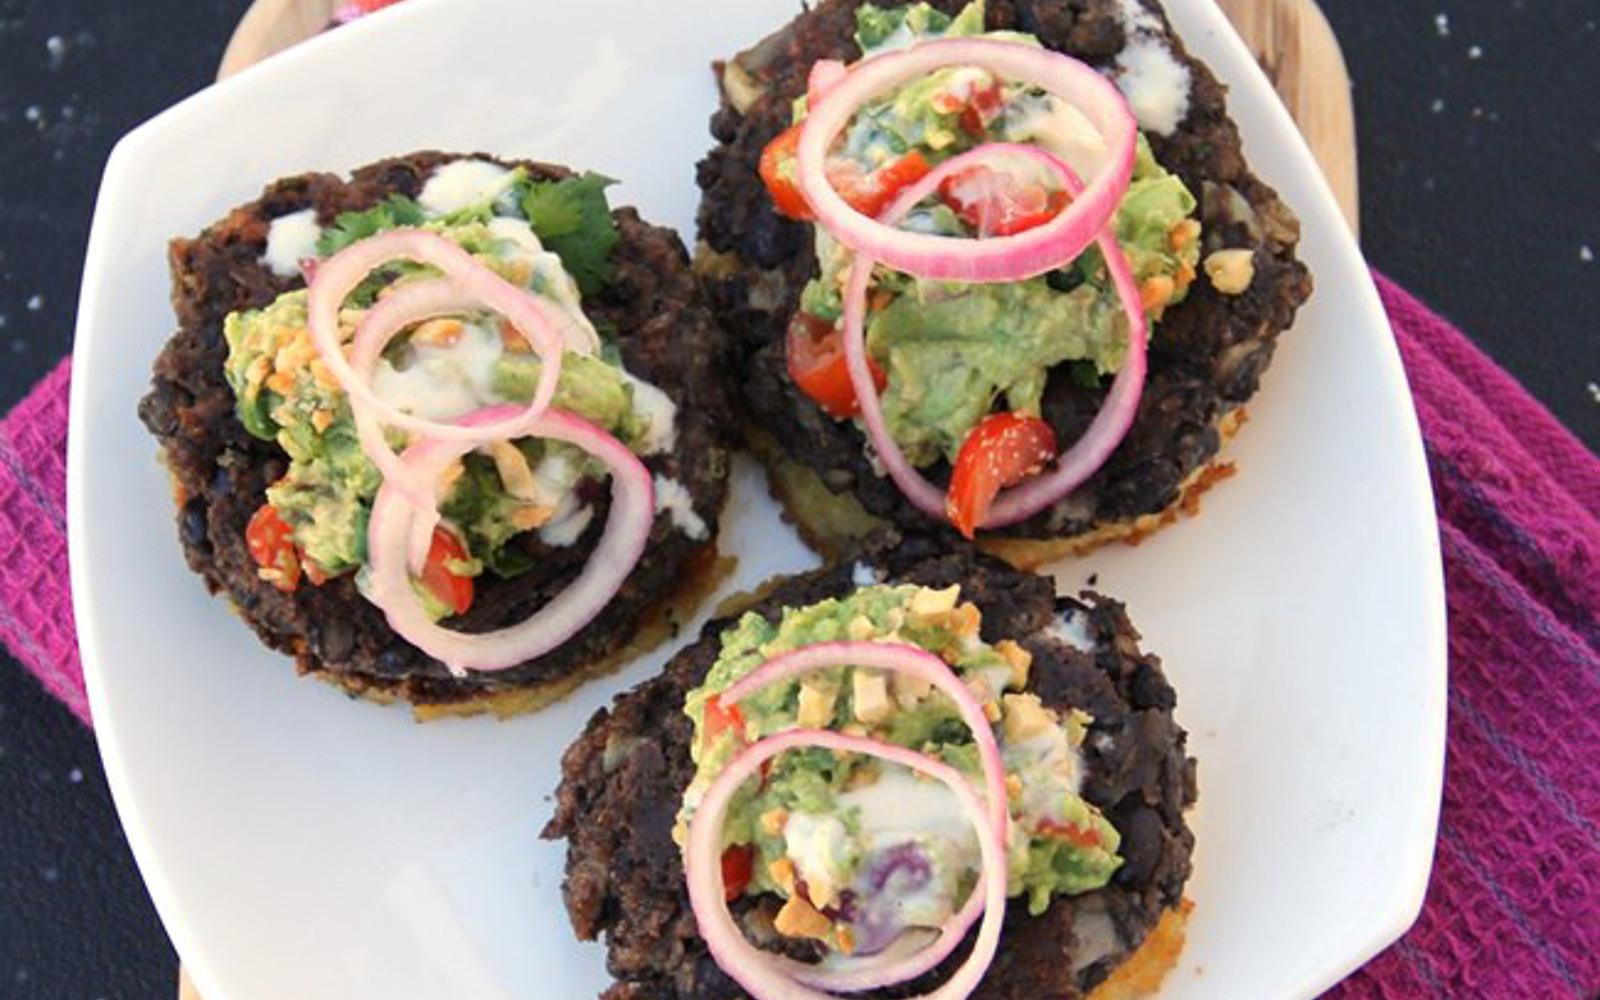 Cilantro Black Bean Burgers Over Polenta Cakes [Vegan, Gluten-Free]